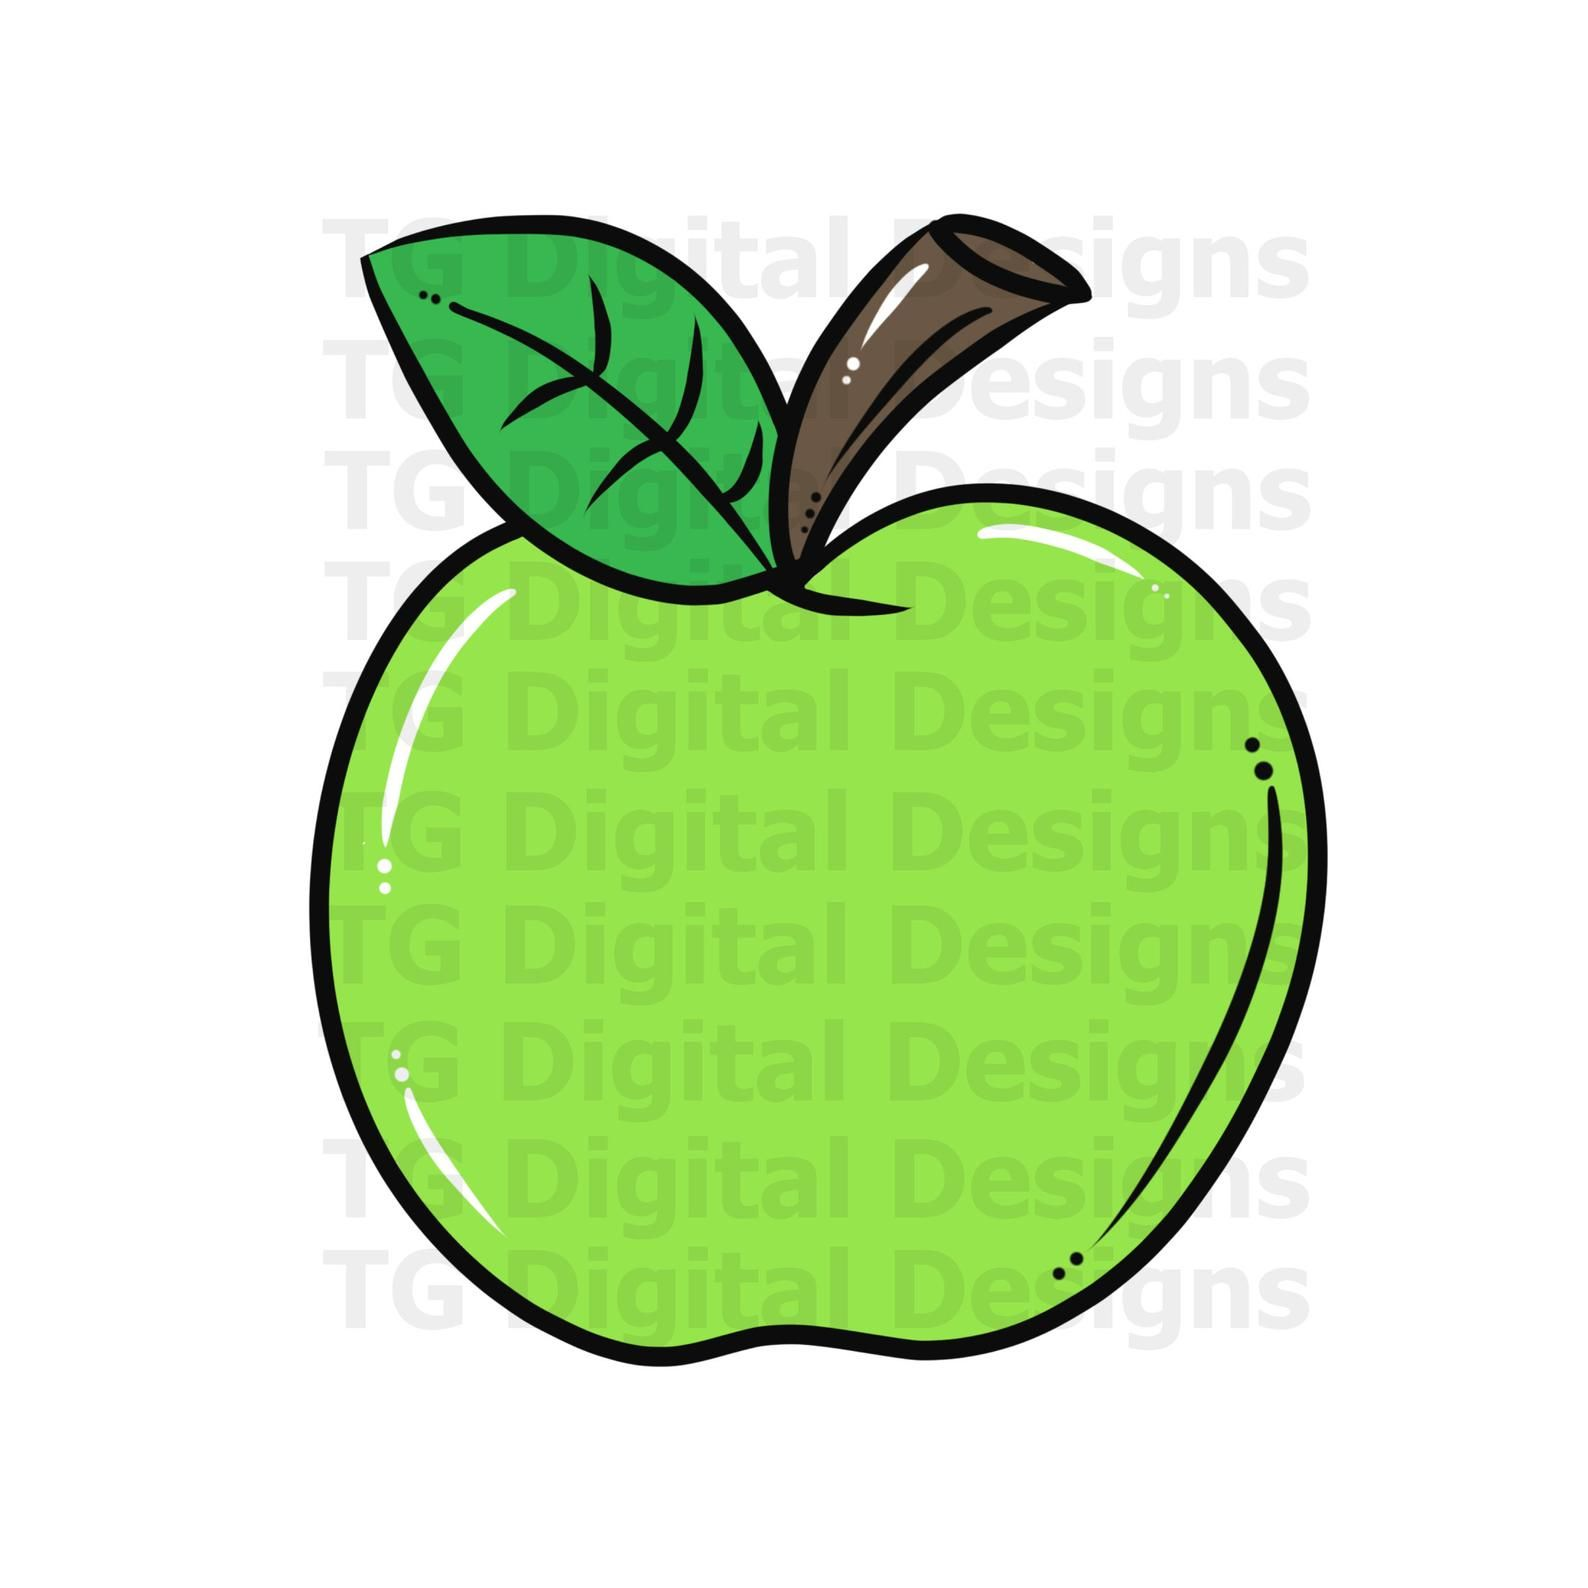 Green Apple Png Apple Clipart Apple Design Apple Printable Apple School Apple Teacher Teacher Png Apple Digital Download File Apple Design Clip Art Apple School